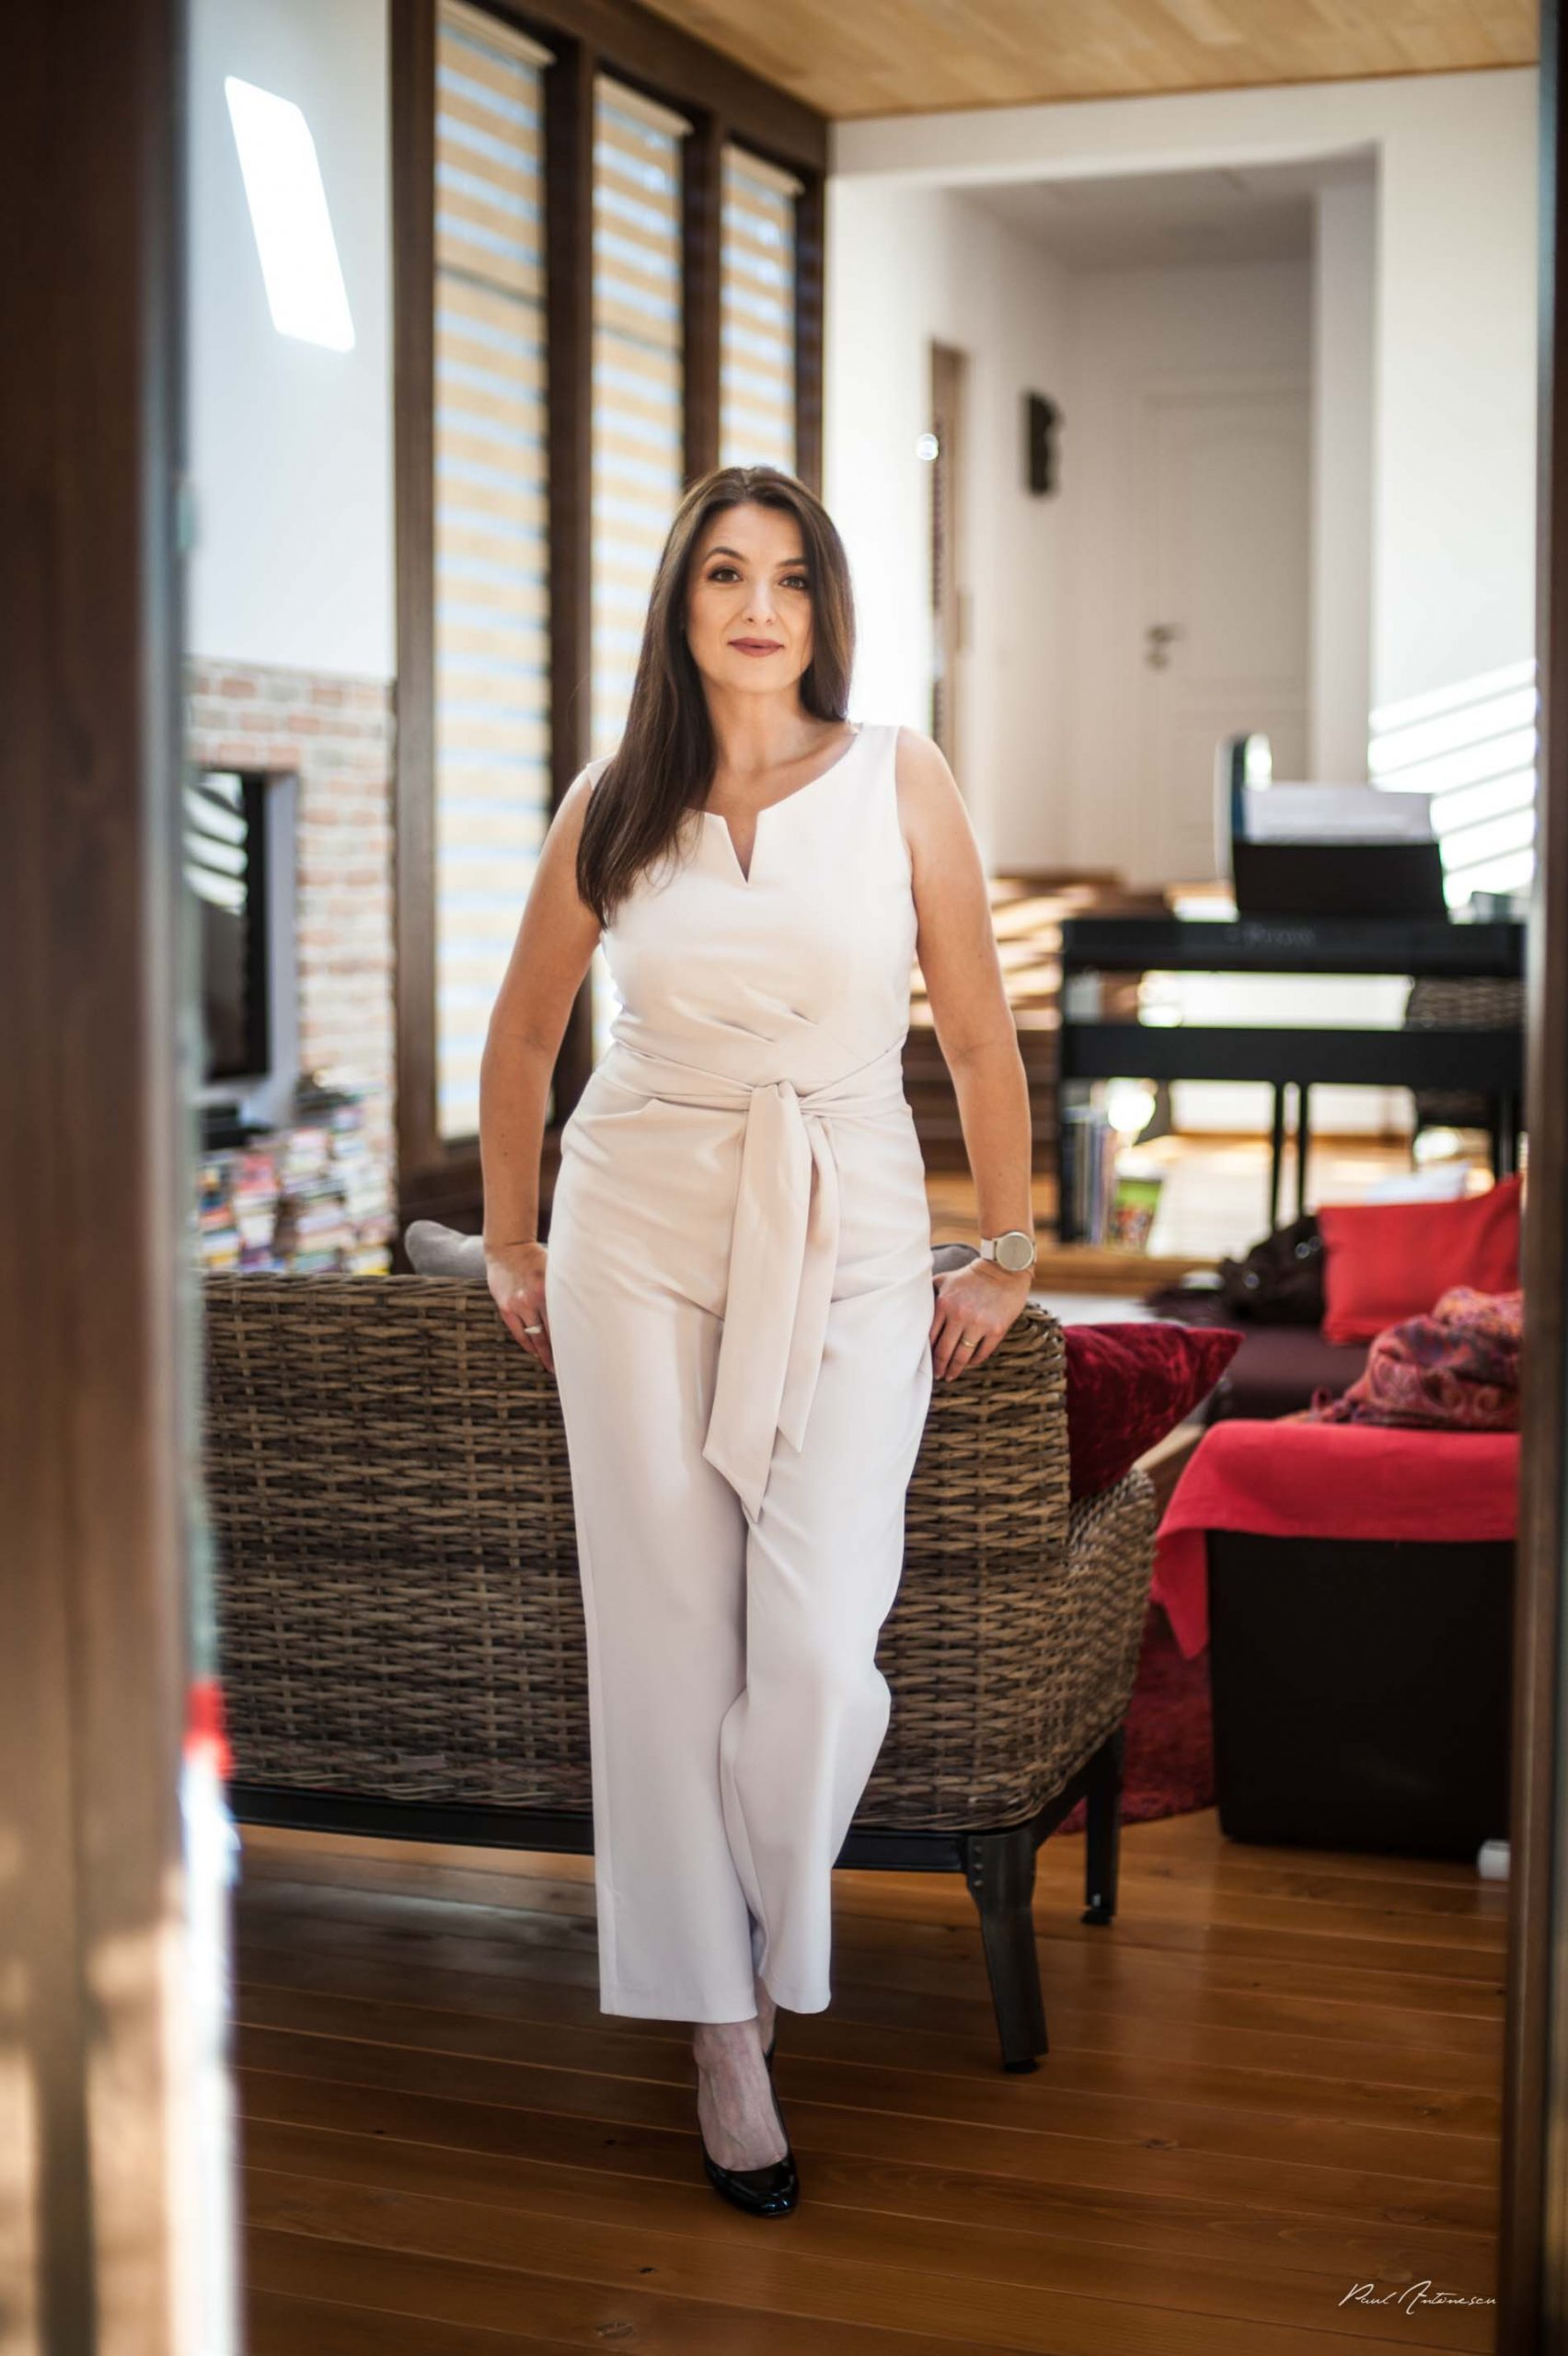 Doamna fotografiata minimalist, razand, cu par lung, negru, la lumina naturala, in picioare, in casa.